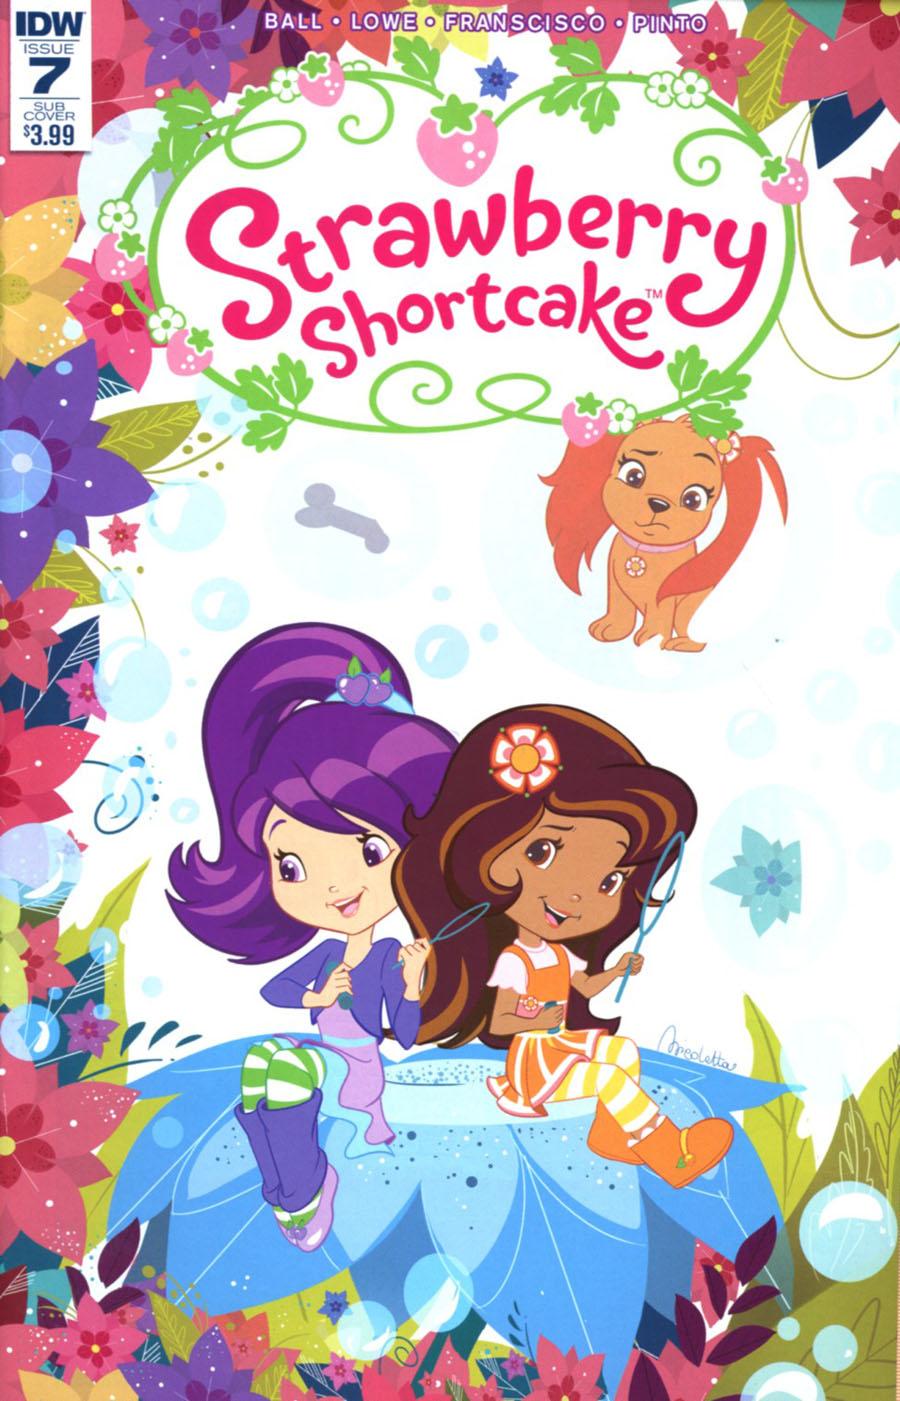 Strawberry Shortcake Vol 3 #7 Cover C Variant Nicoletta Baldari Subscription Cover